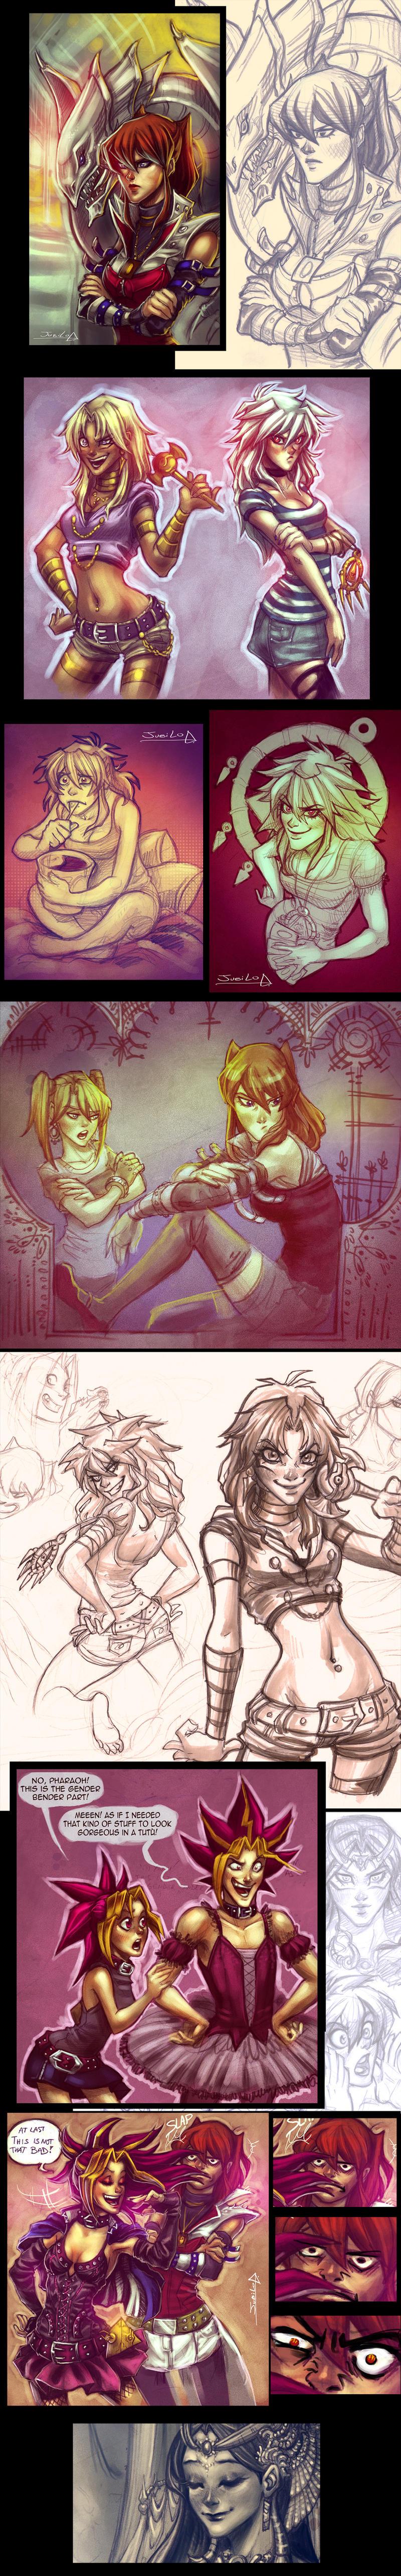 Yu gi oh - Gender Bender by Rivan145th